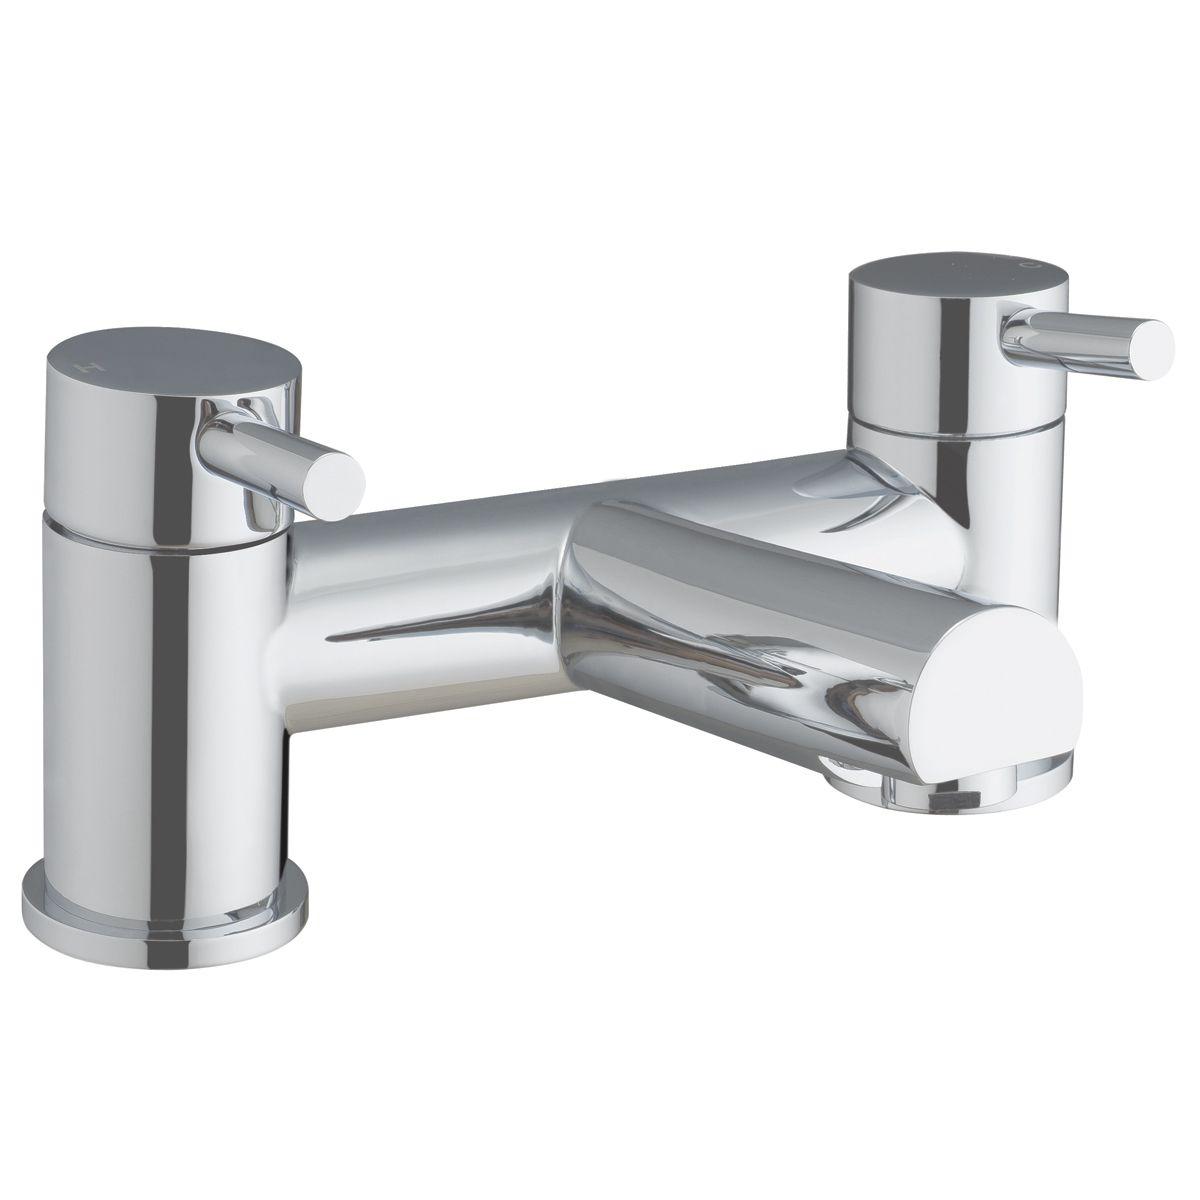 RAK Prima Bath Filler Tap